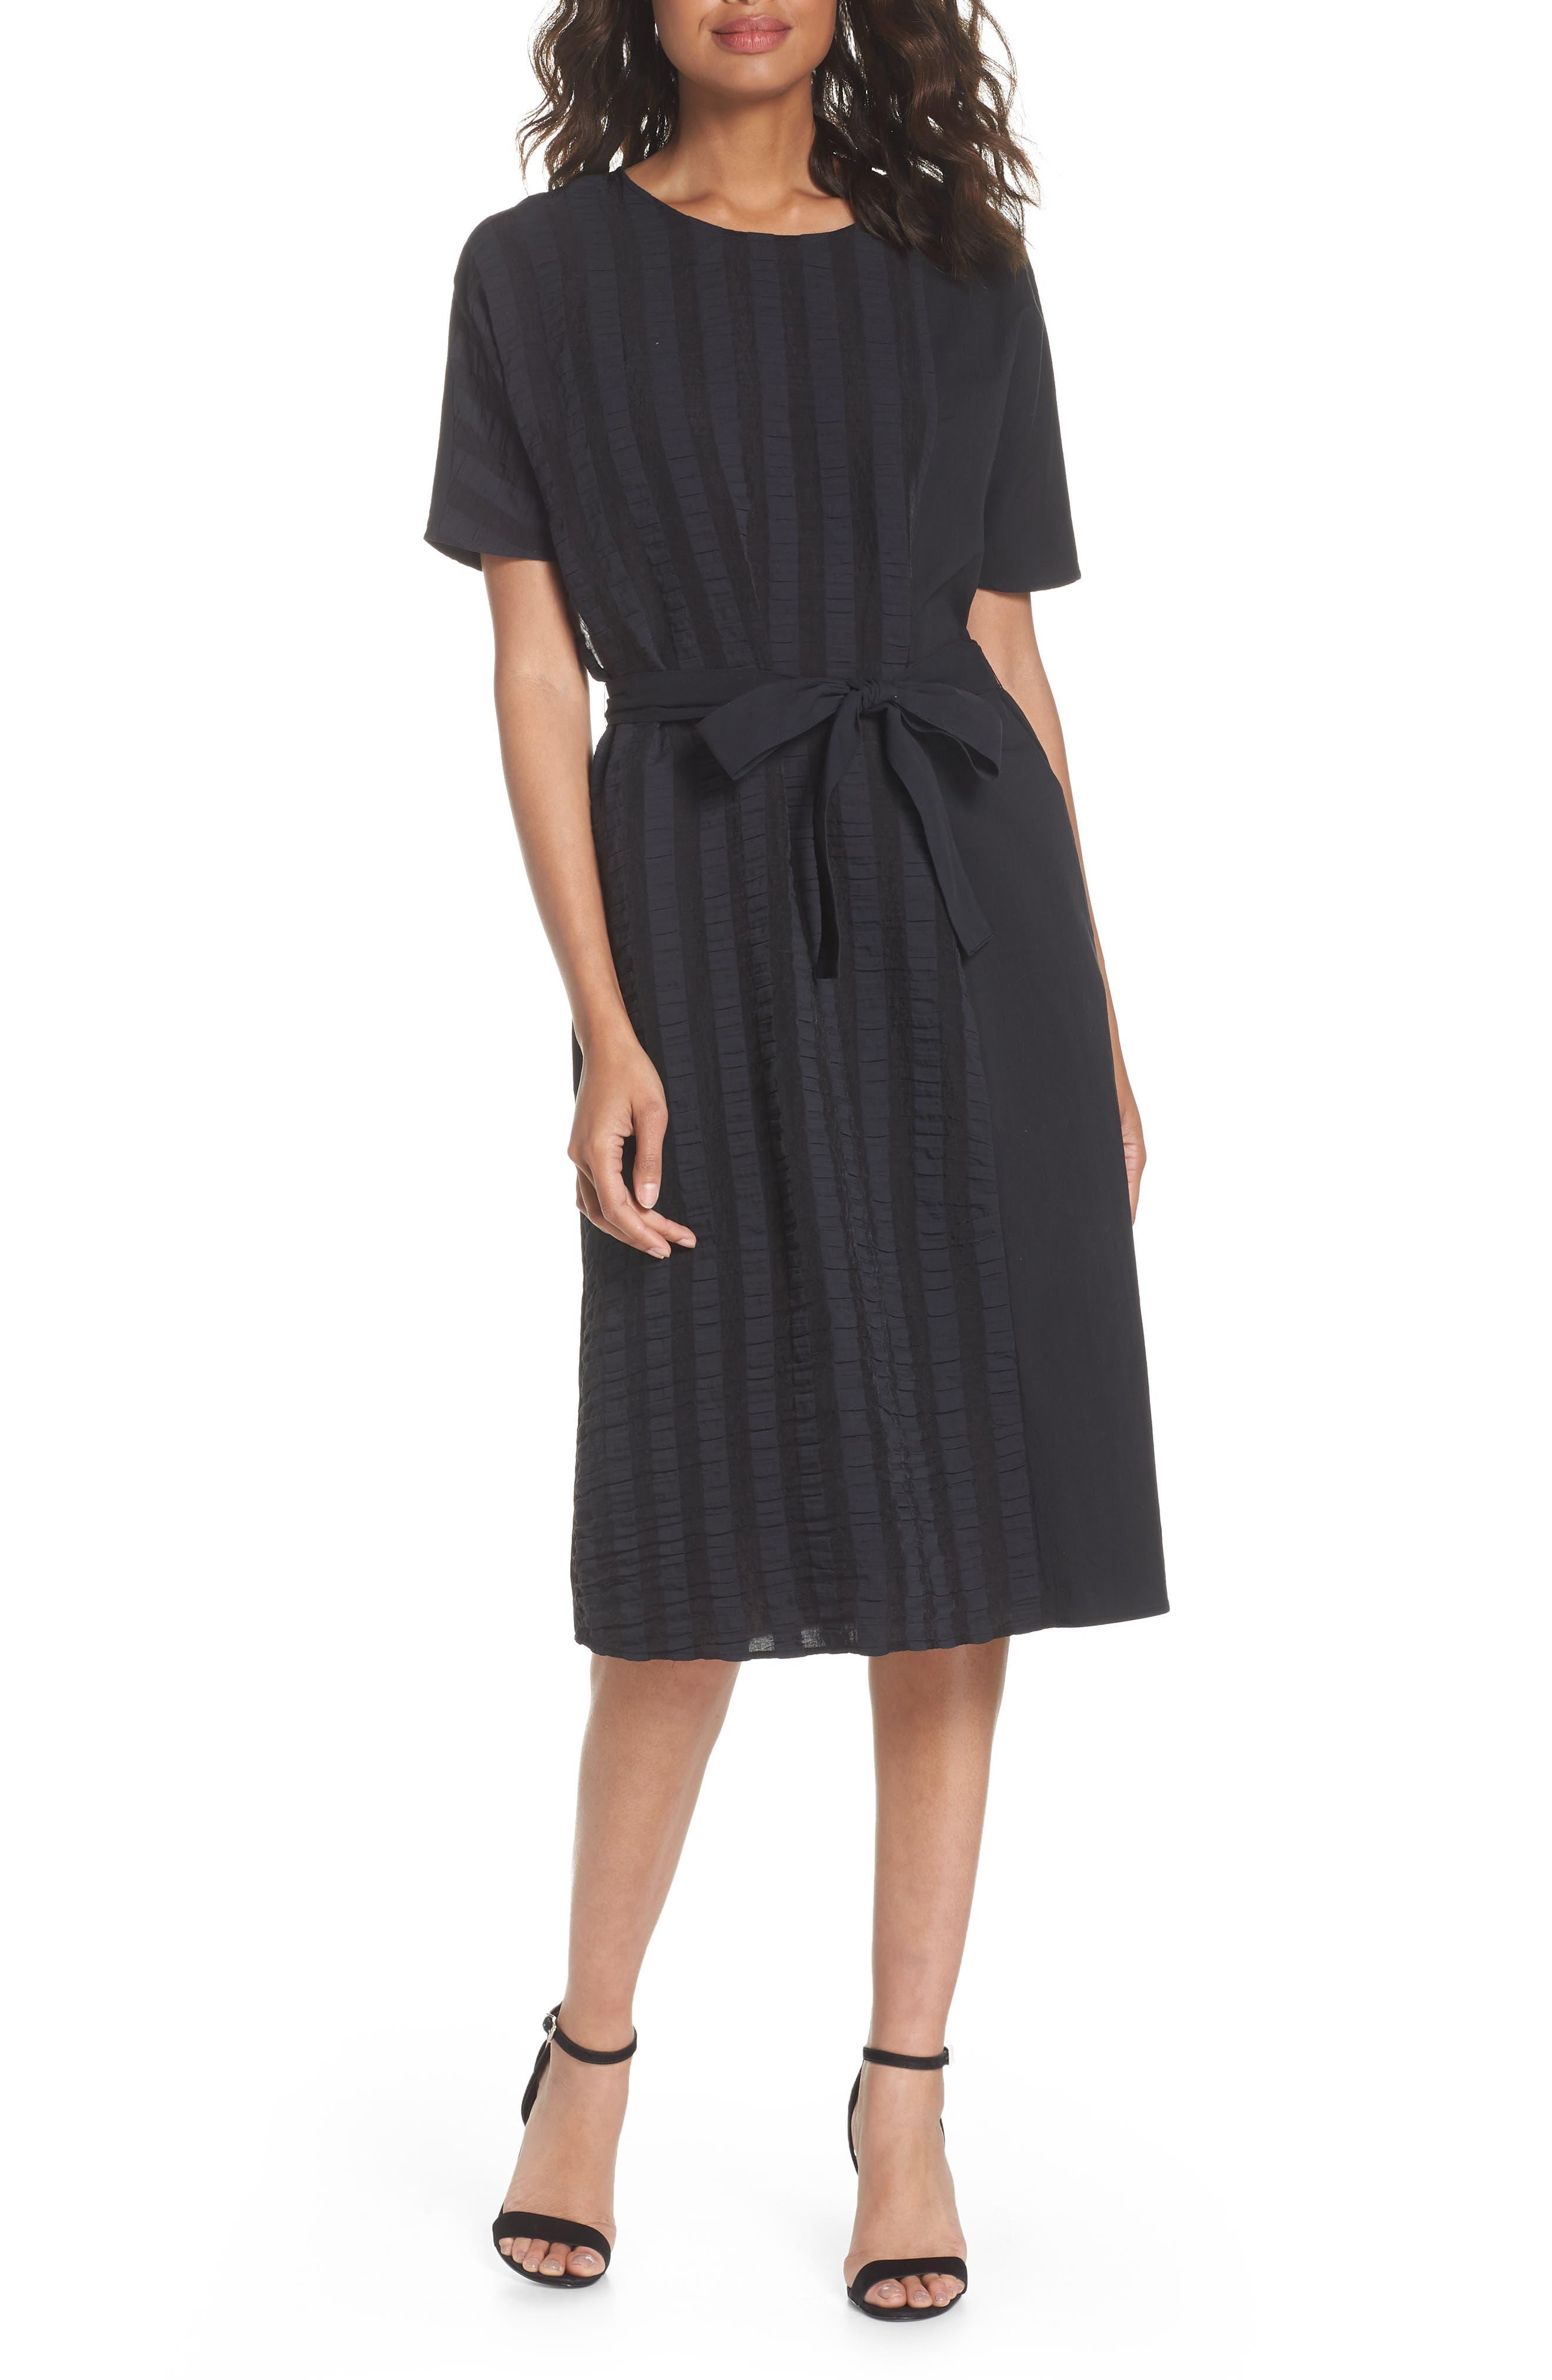 Throwing Shade Midi Dress,                         Main,                         color, 001